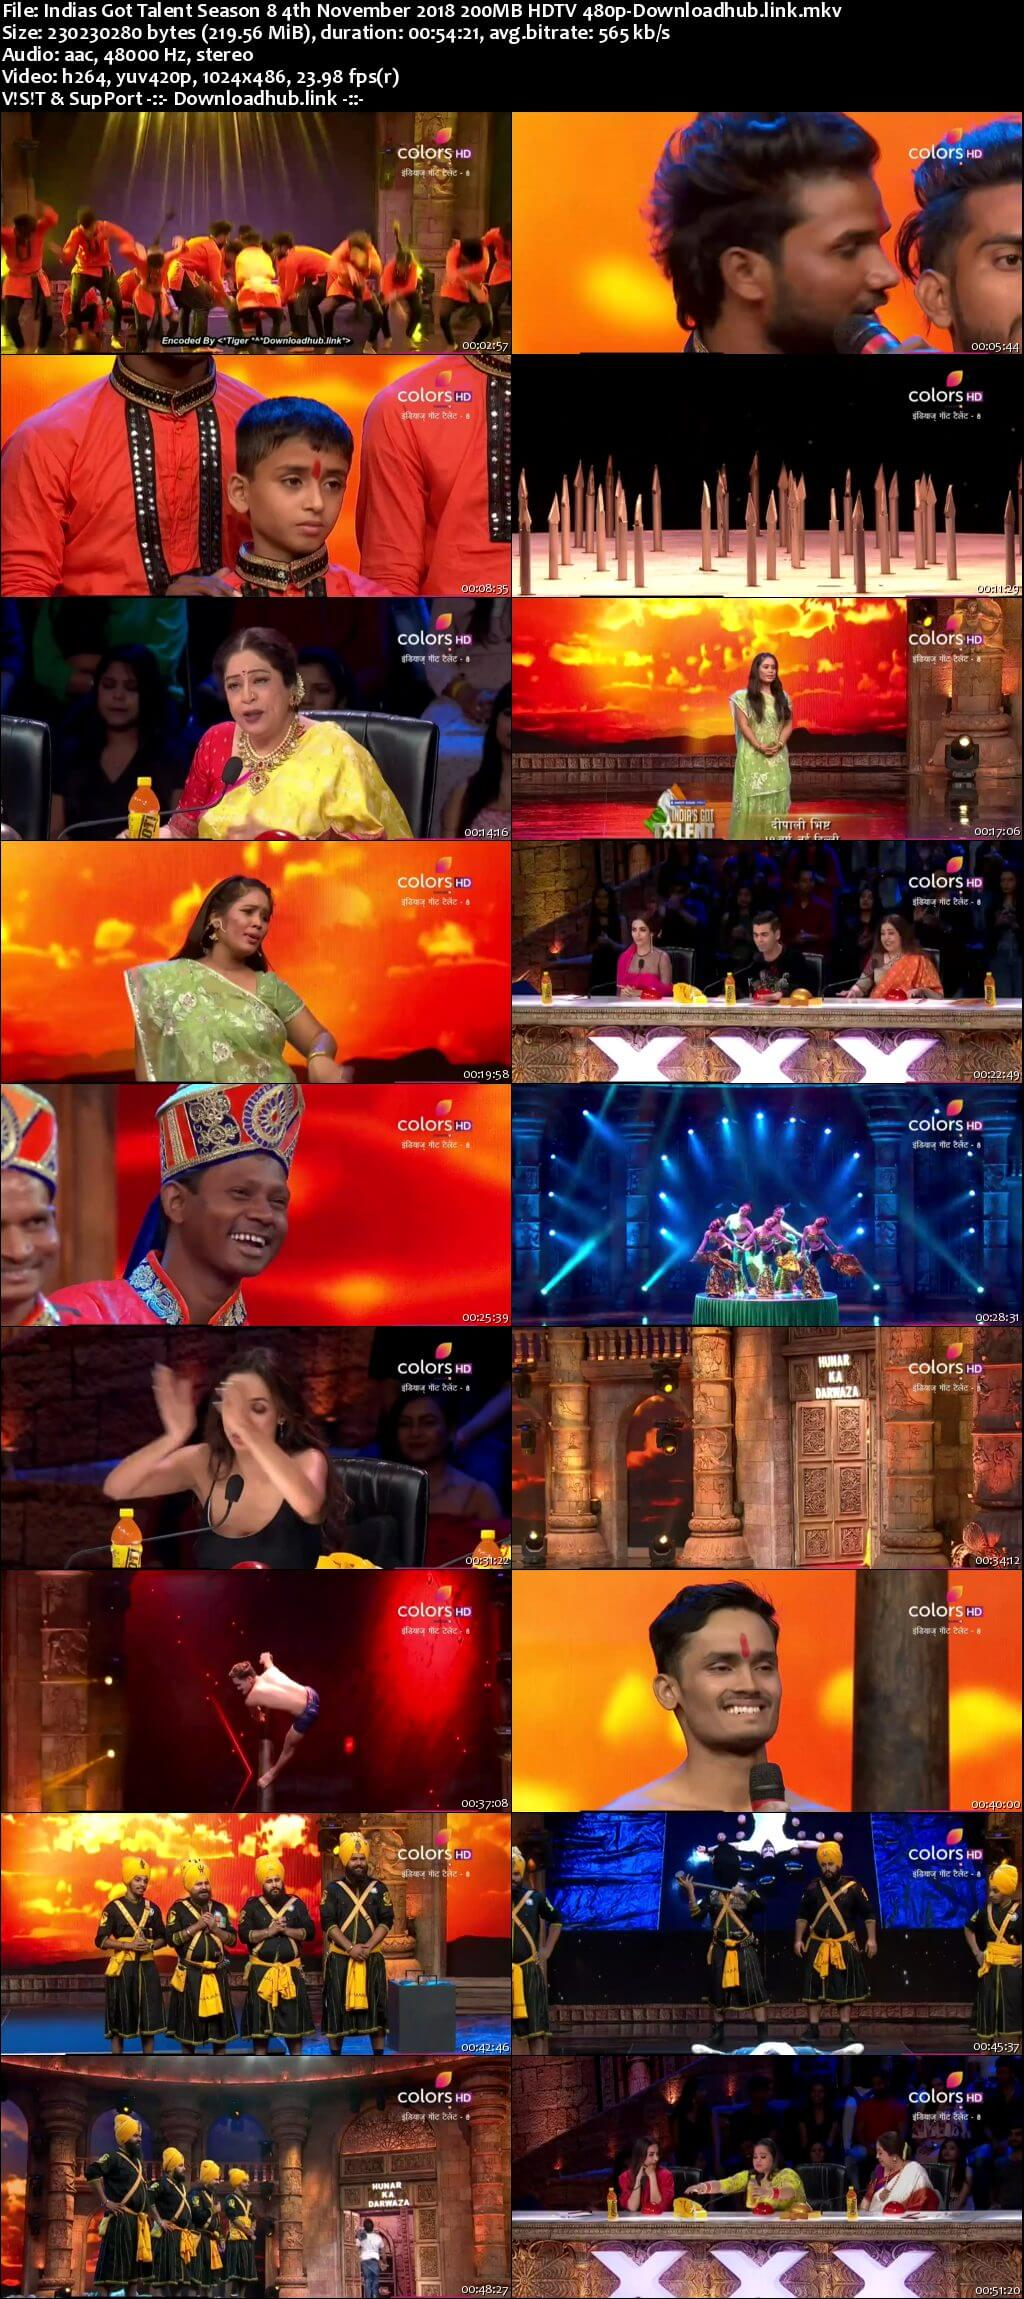 Indias Got Talent Season 8 04 November 2018 Episode 06 HDTV 480p